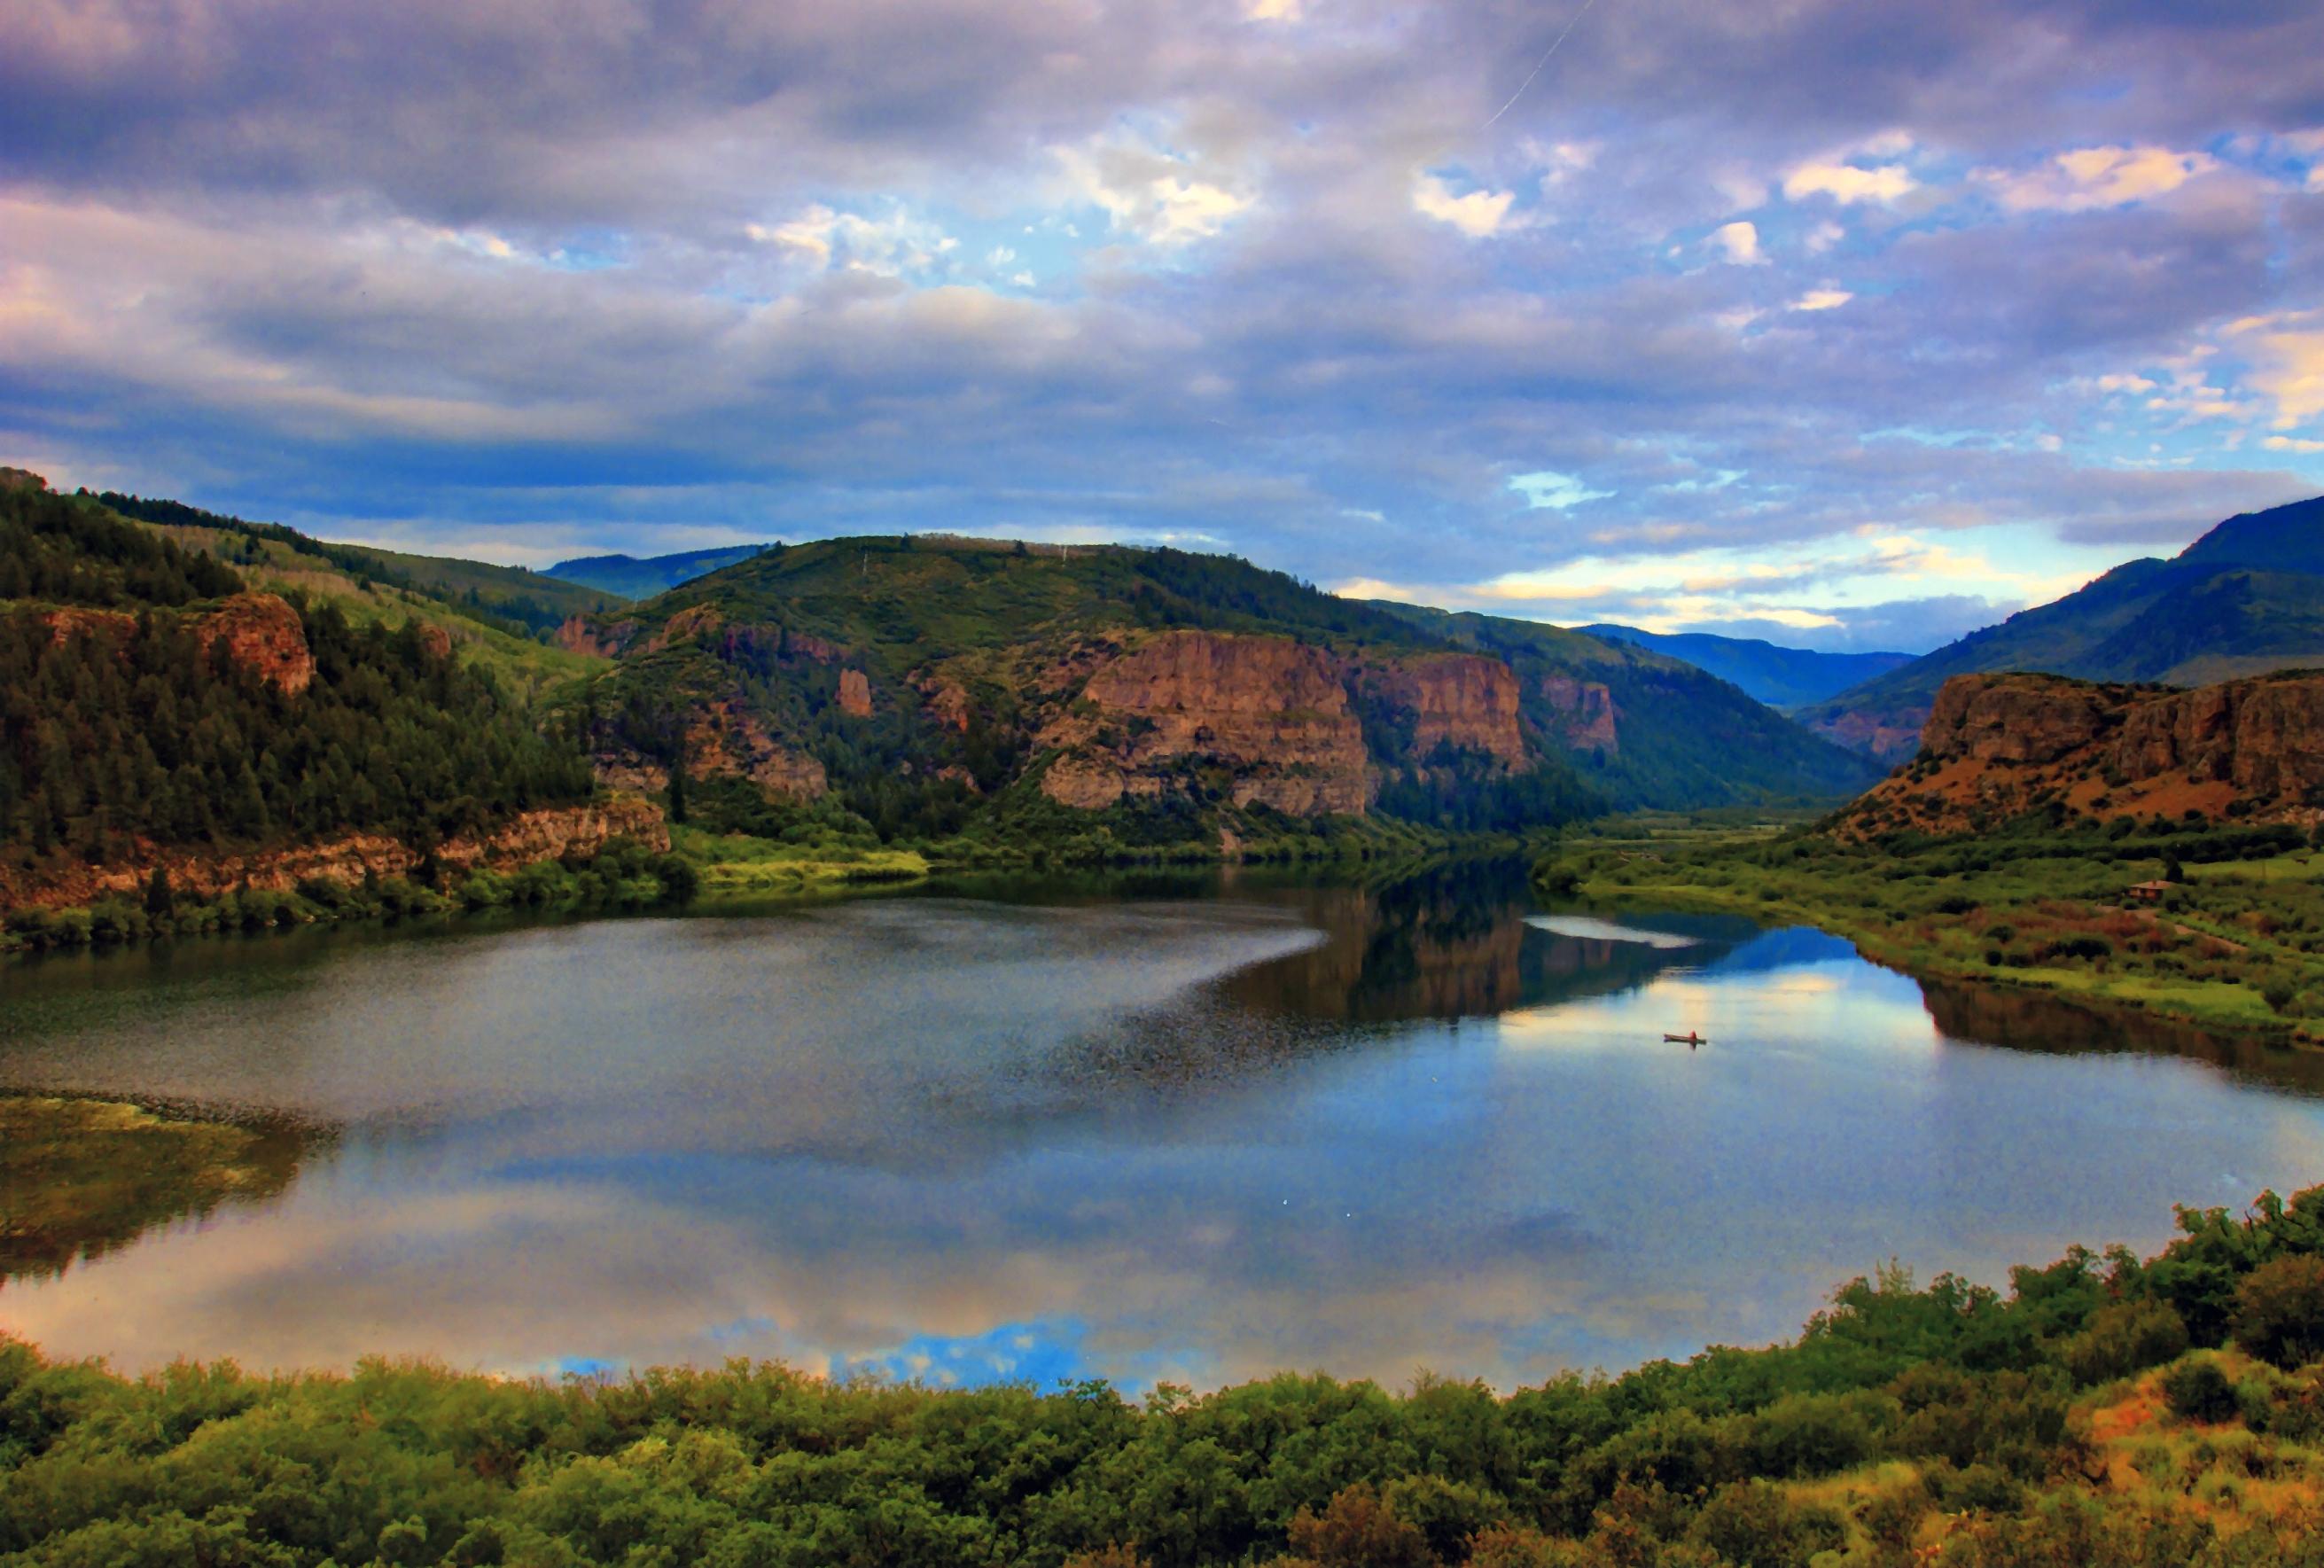 Sweetwater Lake ranch for sale as Vaspen bottled water plan stalls